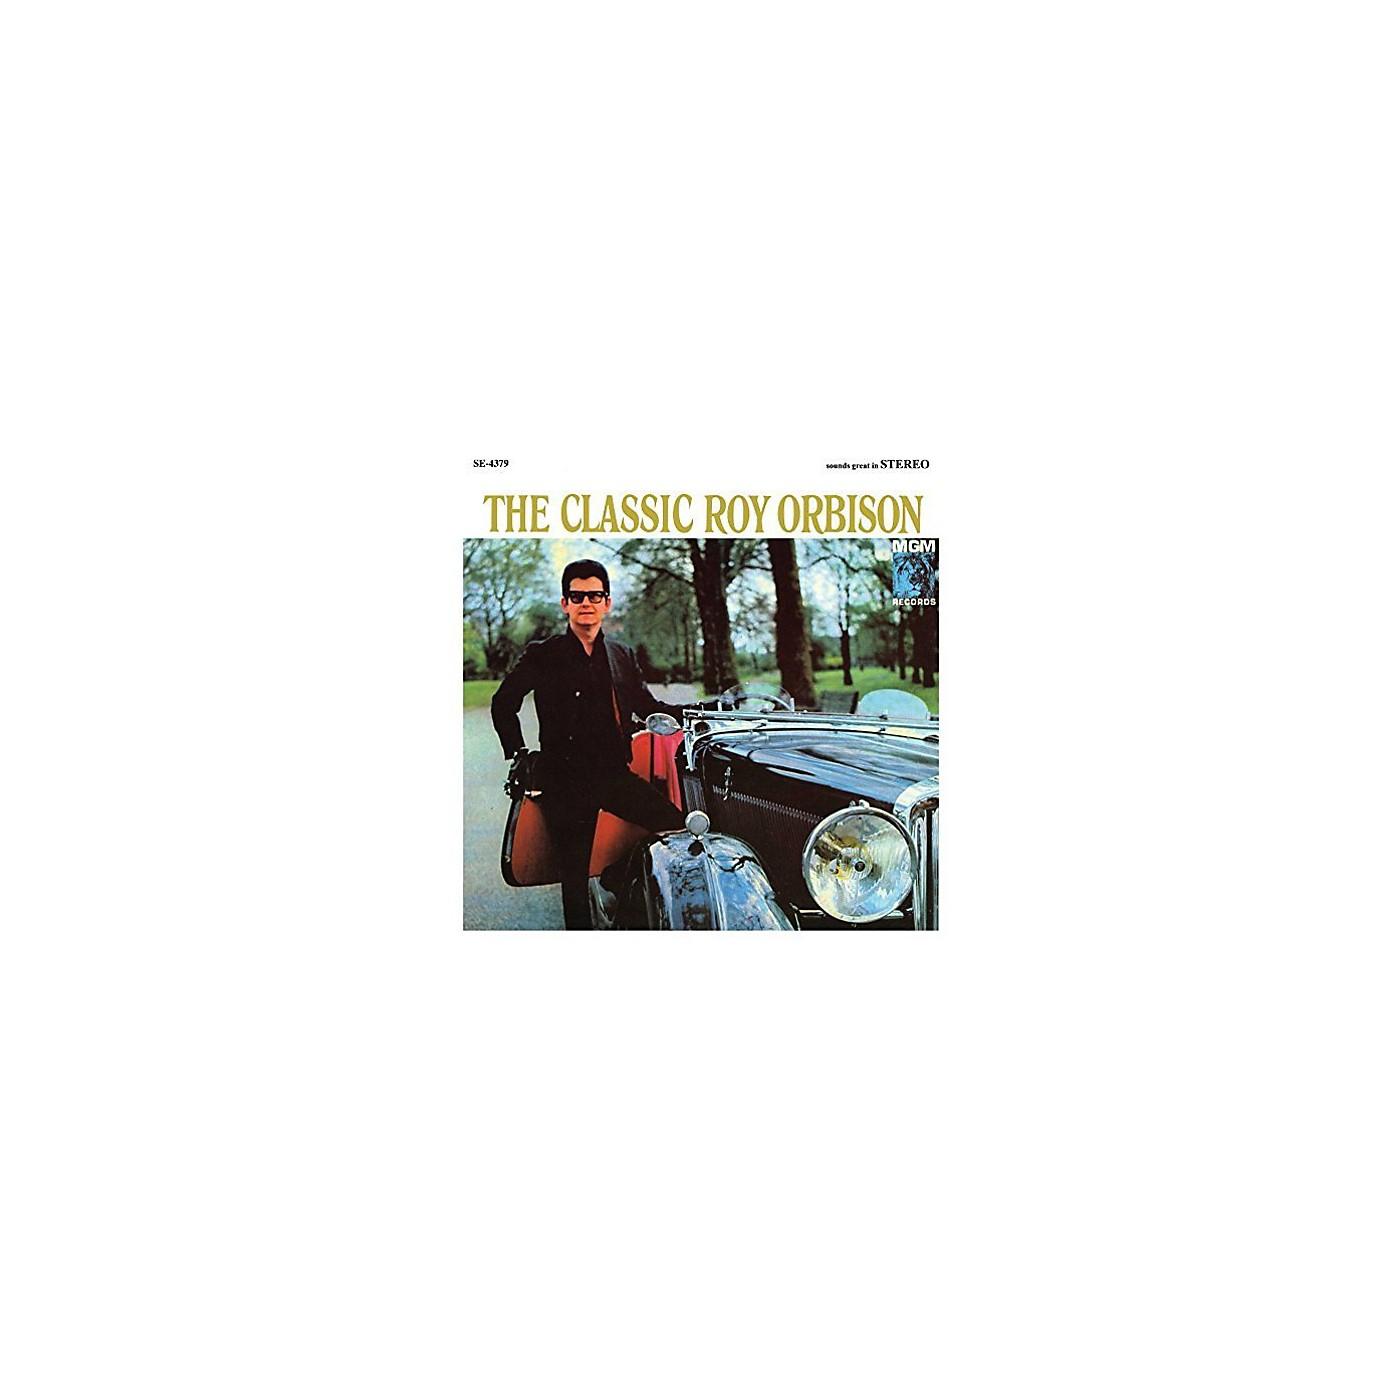 Alliance Roy Orbison - The Classic Roy Orbison thumbnail